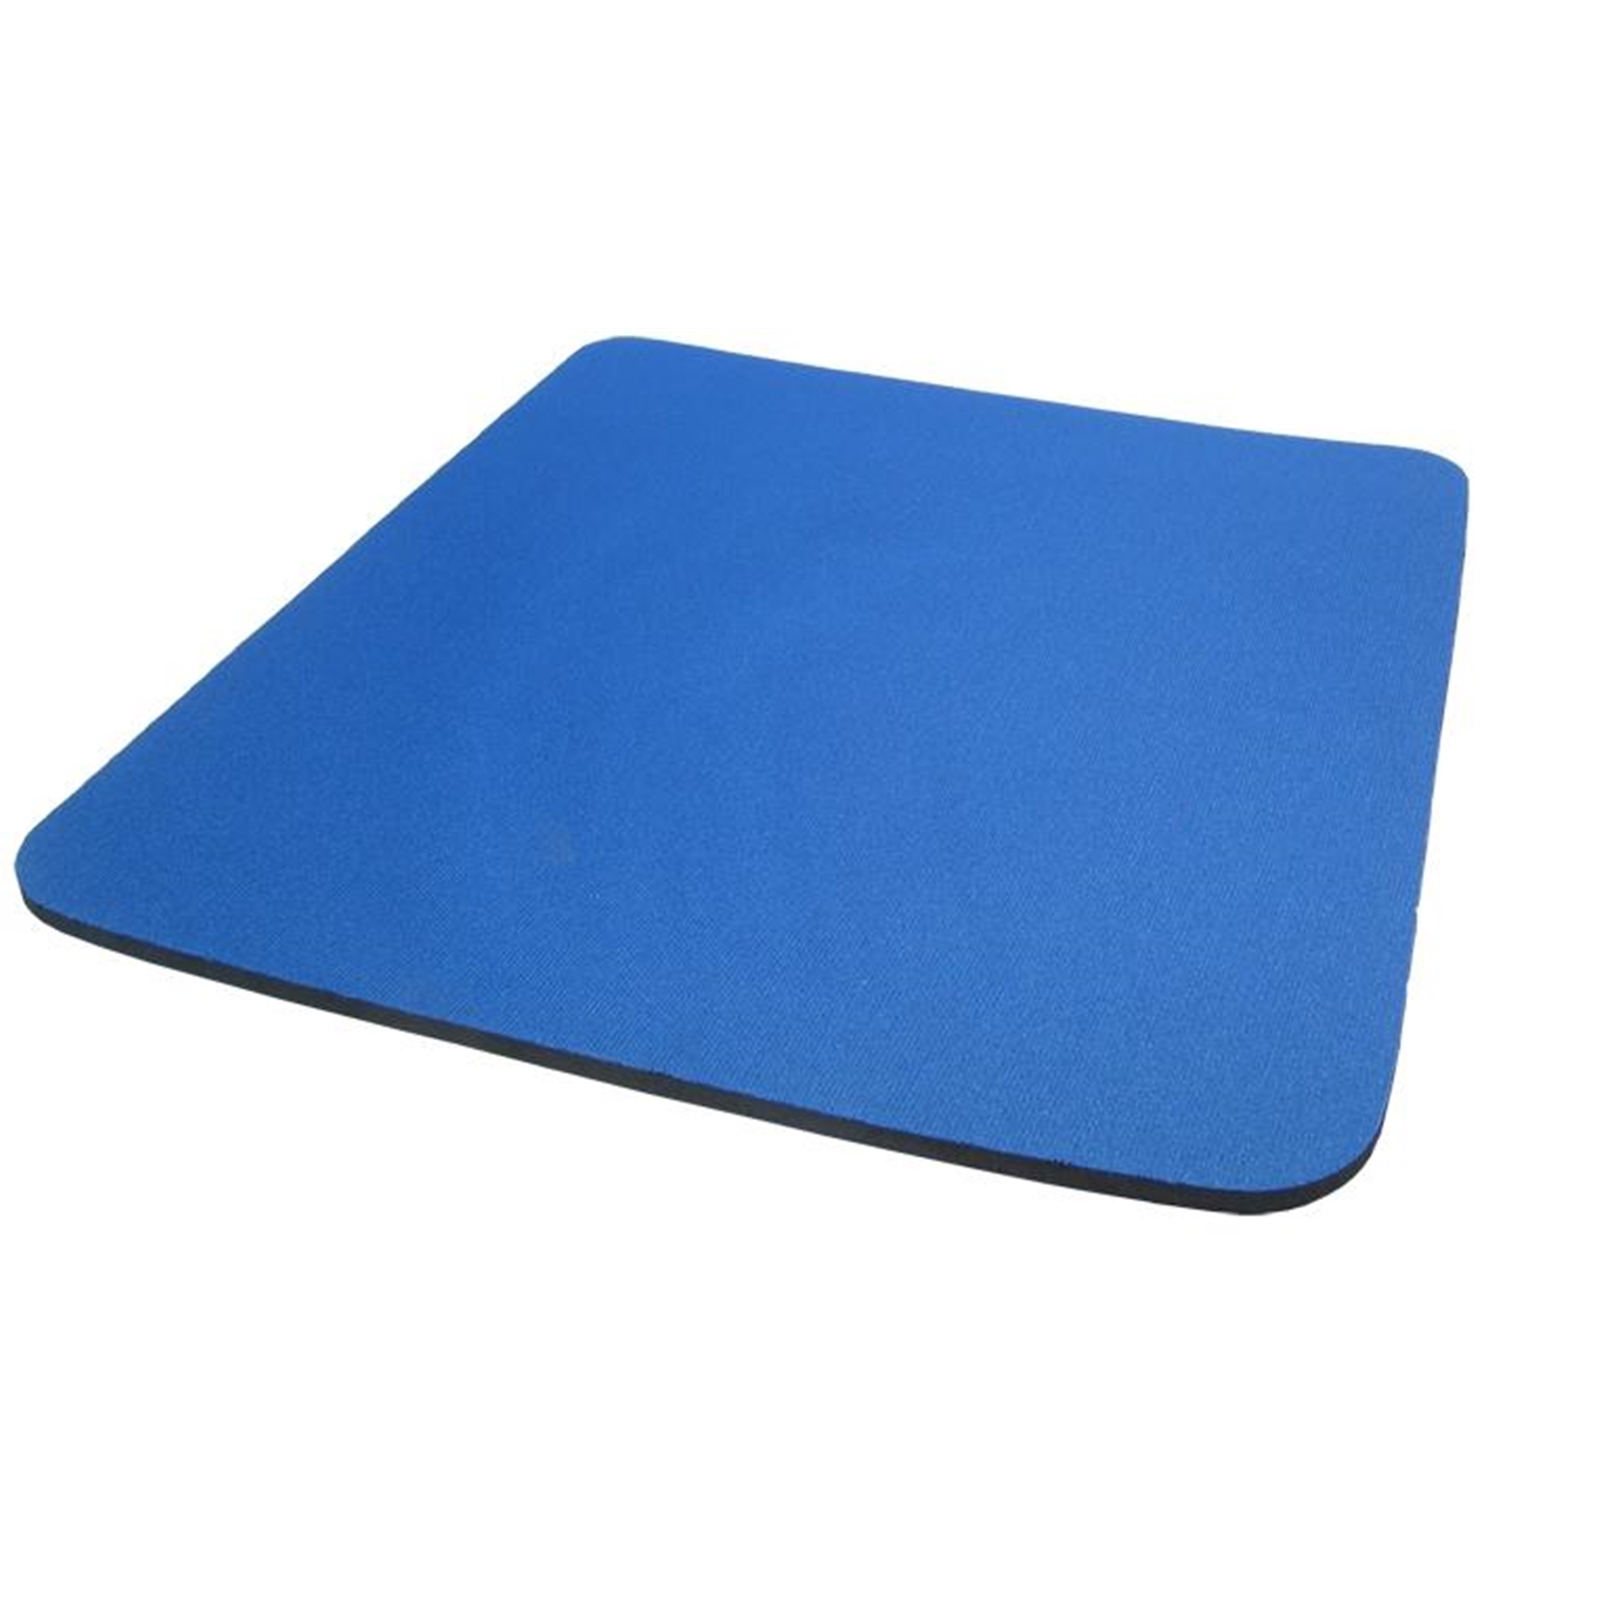 Target Non Slip Blue Mouse Pad